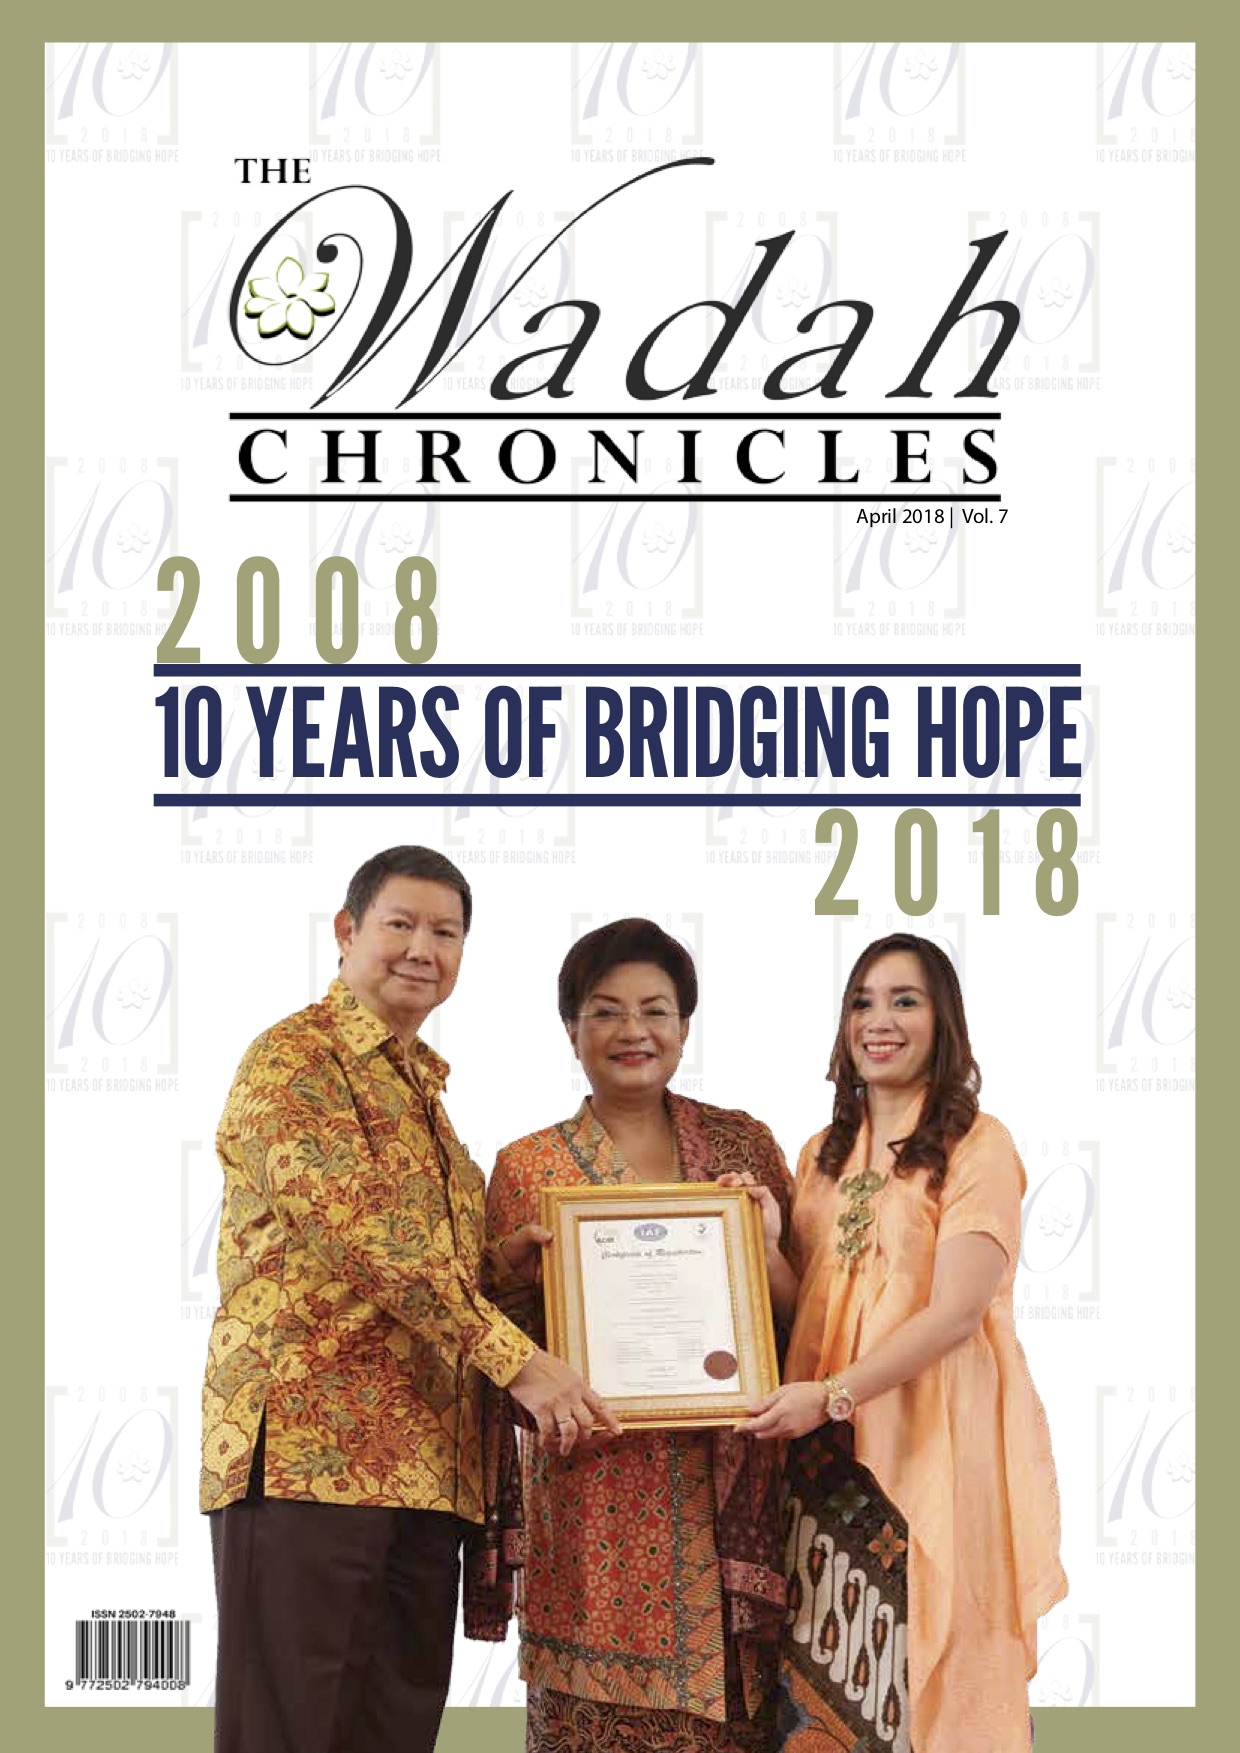 Wadah Chronicles - April 2018